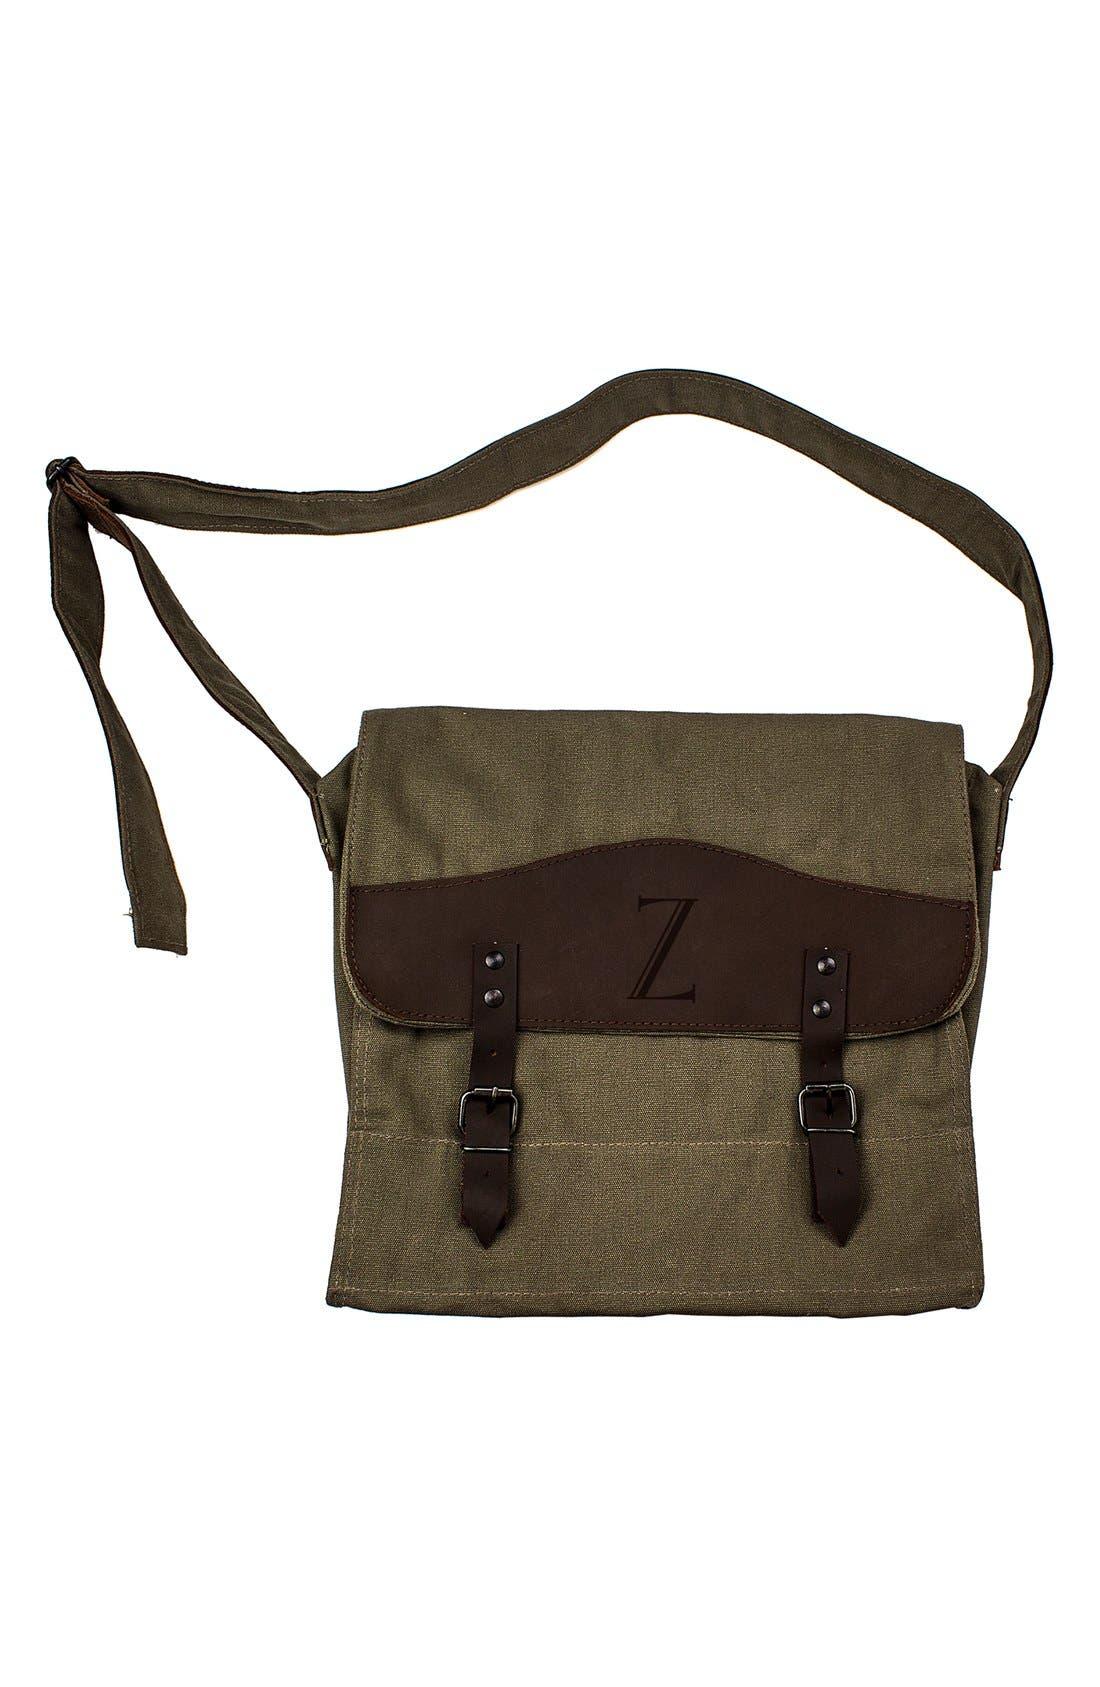 Monogram Messenger Bag,                         Main,                         color, 326